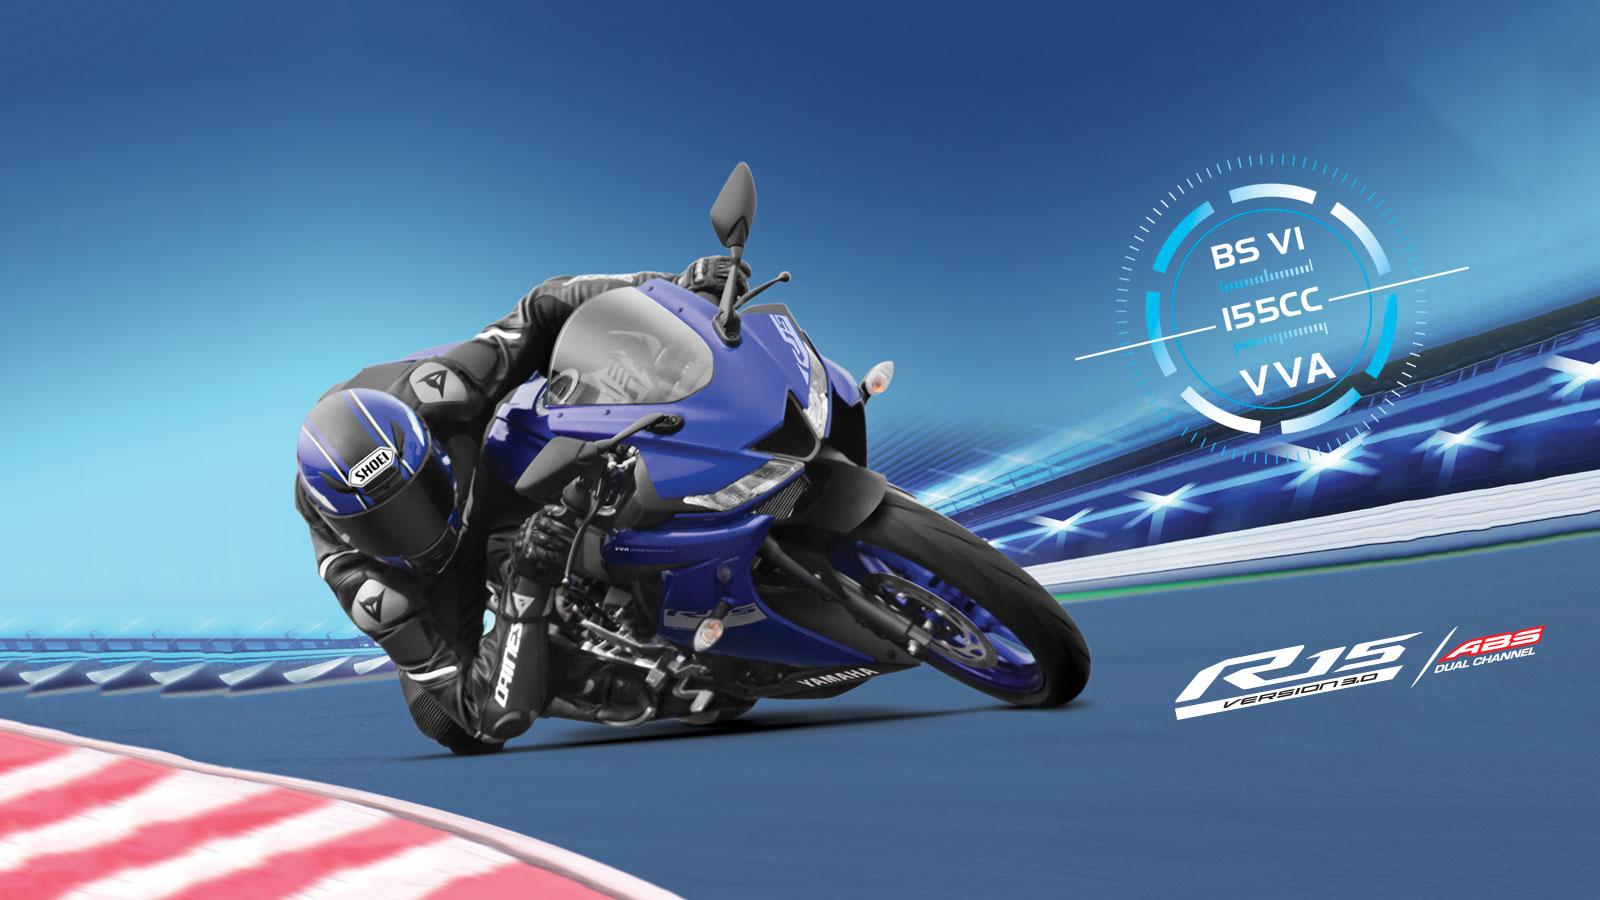 R15 V3 BS VI Moto GP Edition, R15 v3 Price, R15 v3 Mileage